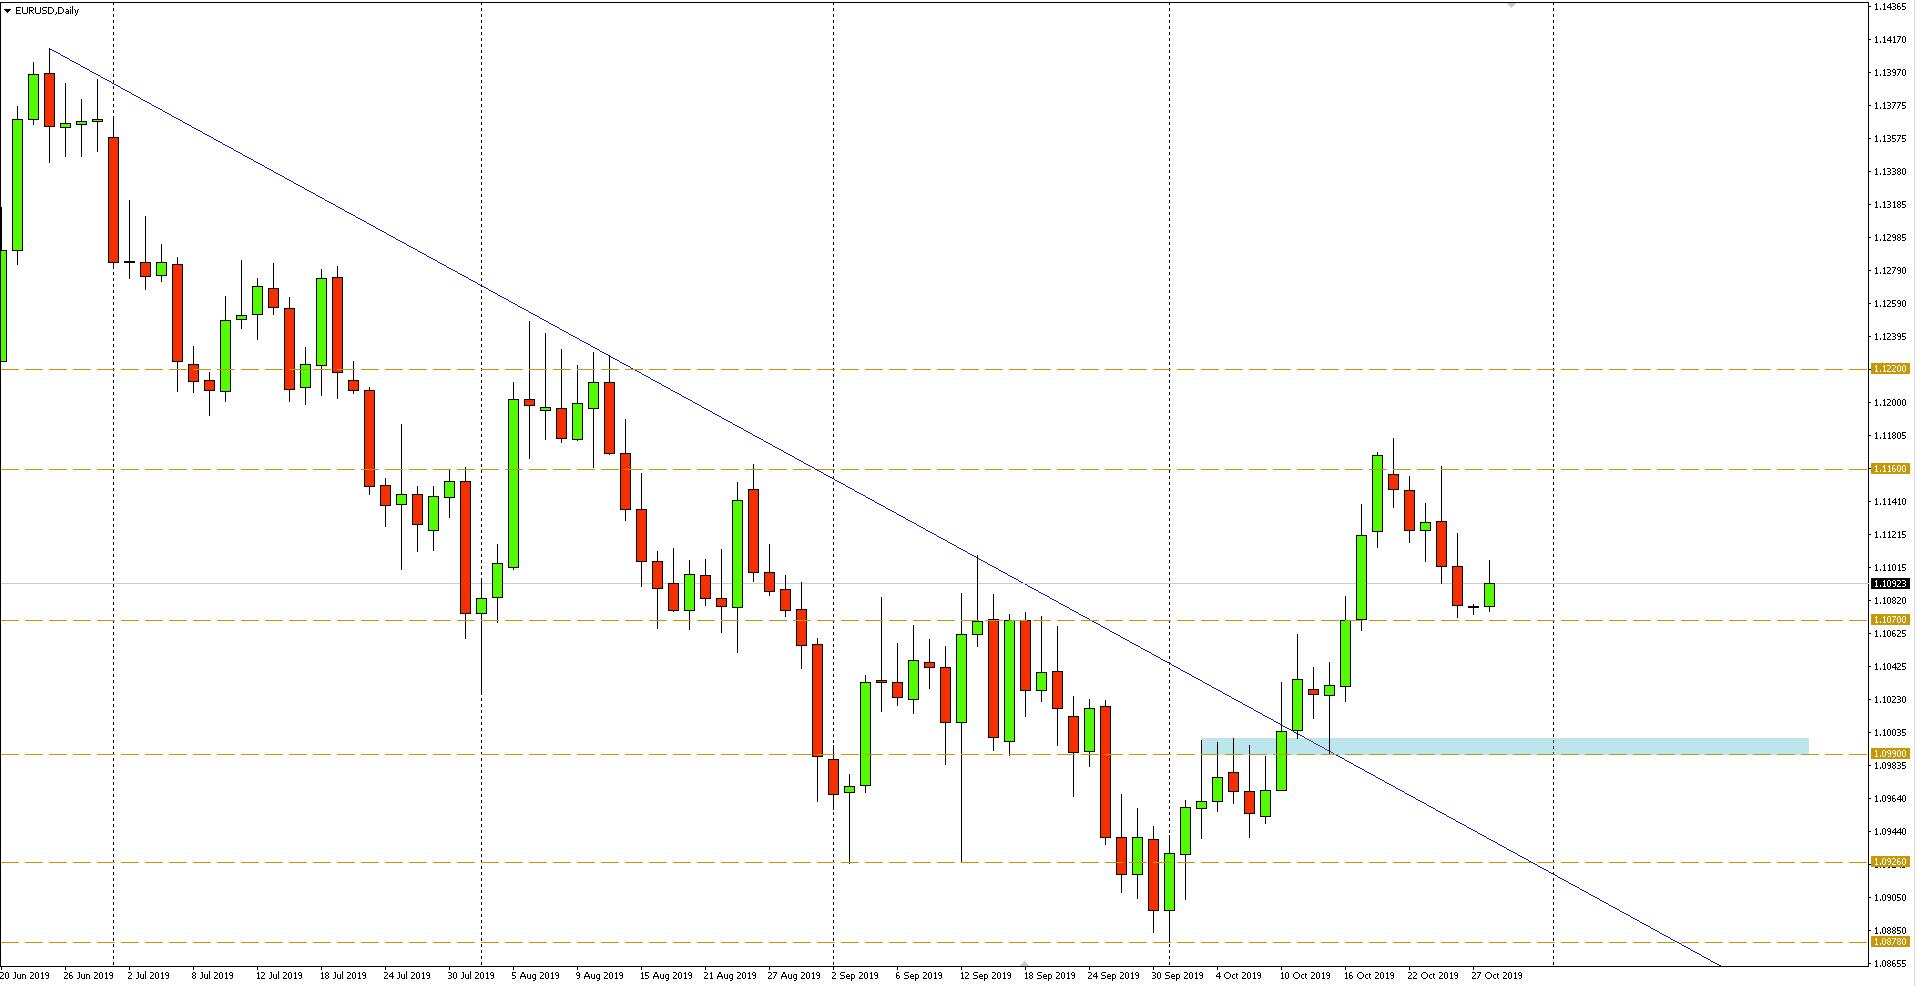 Wykres dzienny - kurs euro do dolara EURUSD